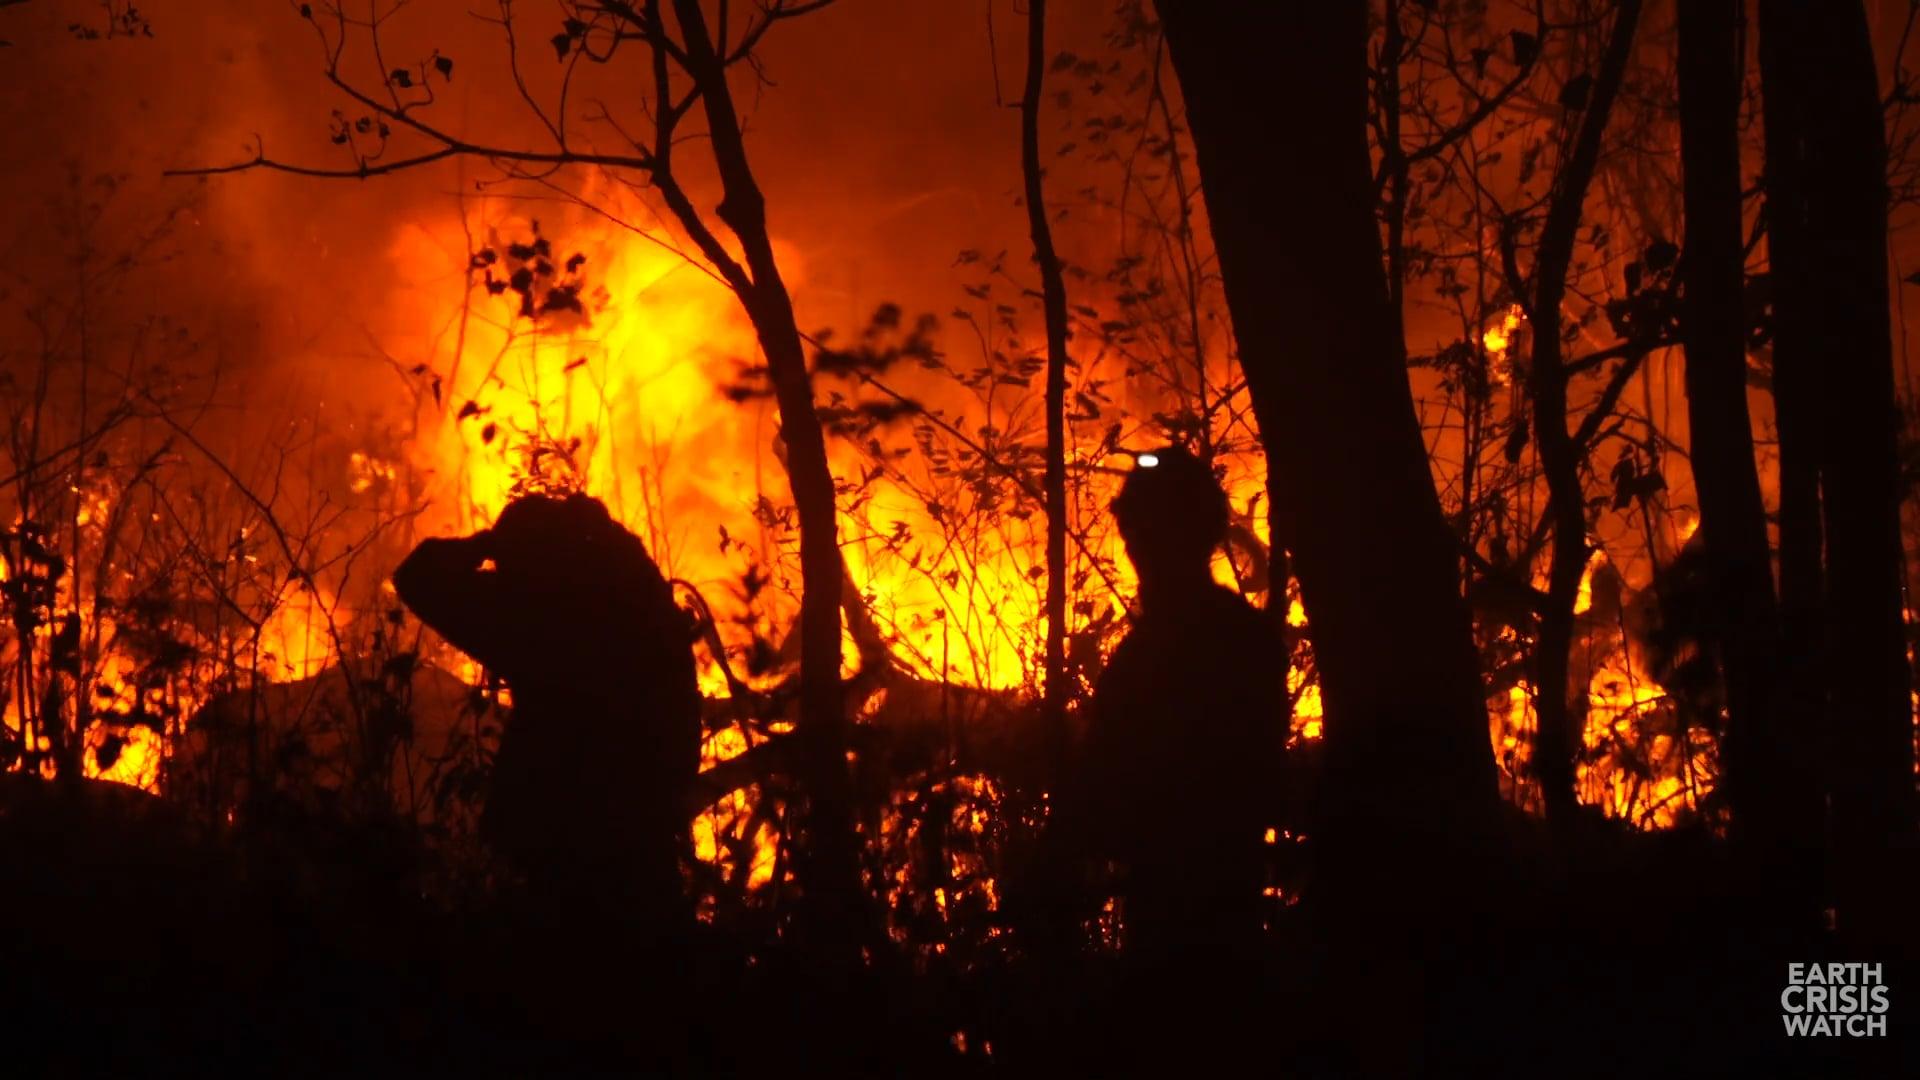 Bolivia's Fires were No Accident